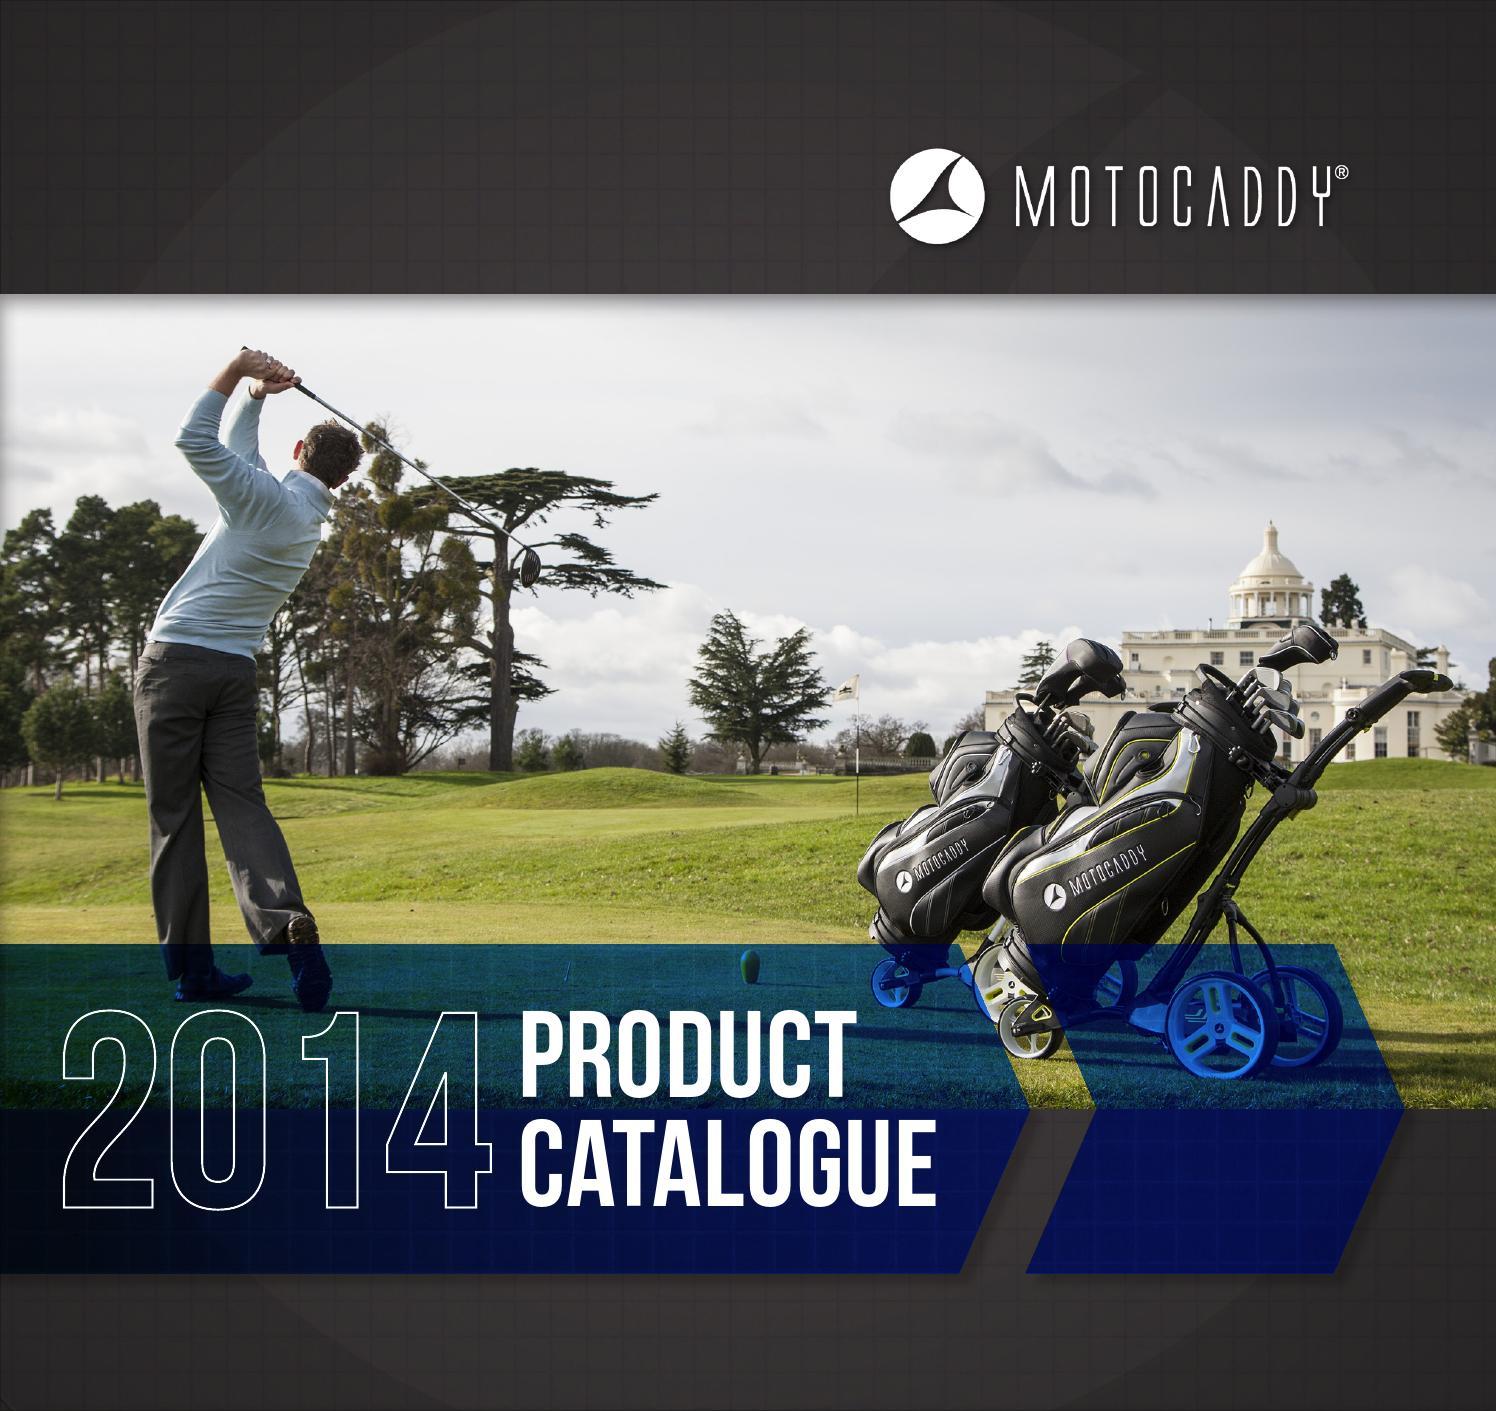 2014 Motocaddy Product Catalogue by Motocaddy - issuu